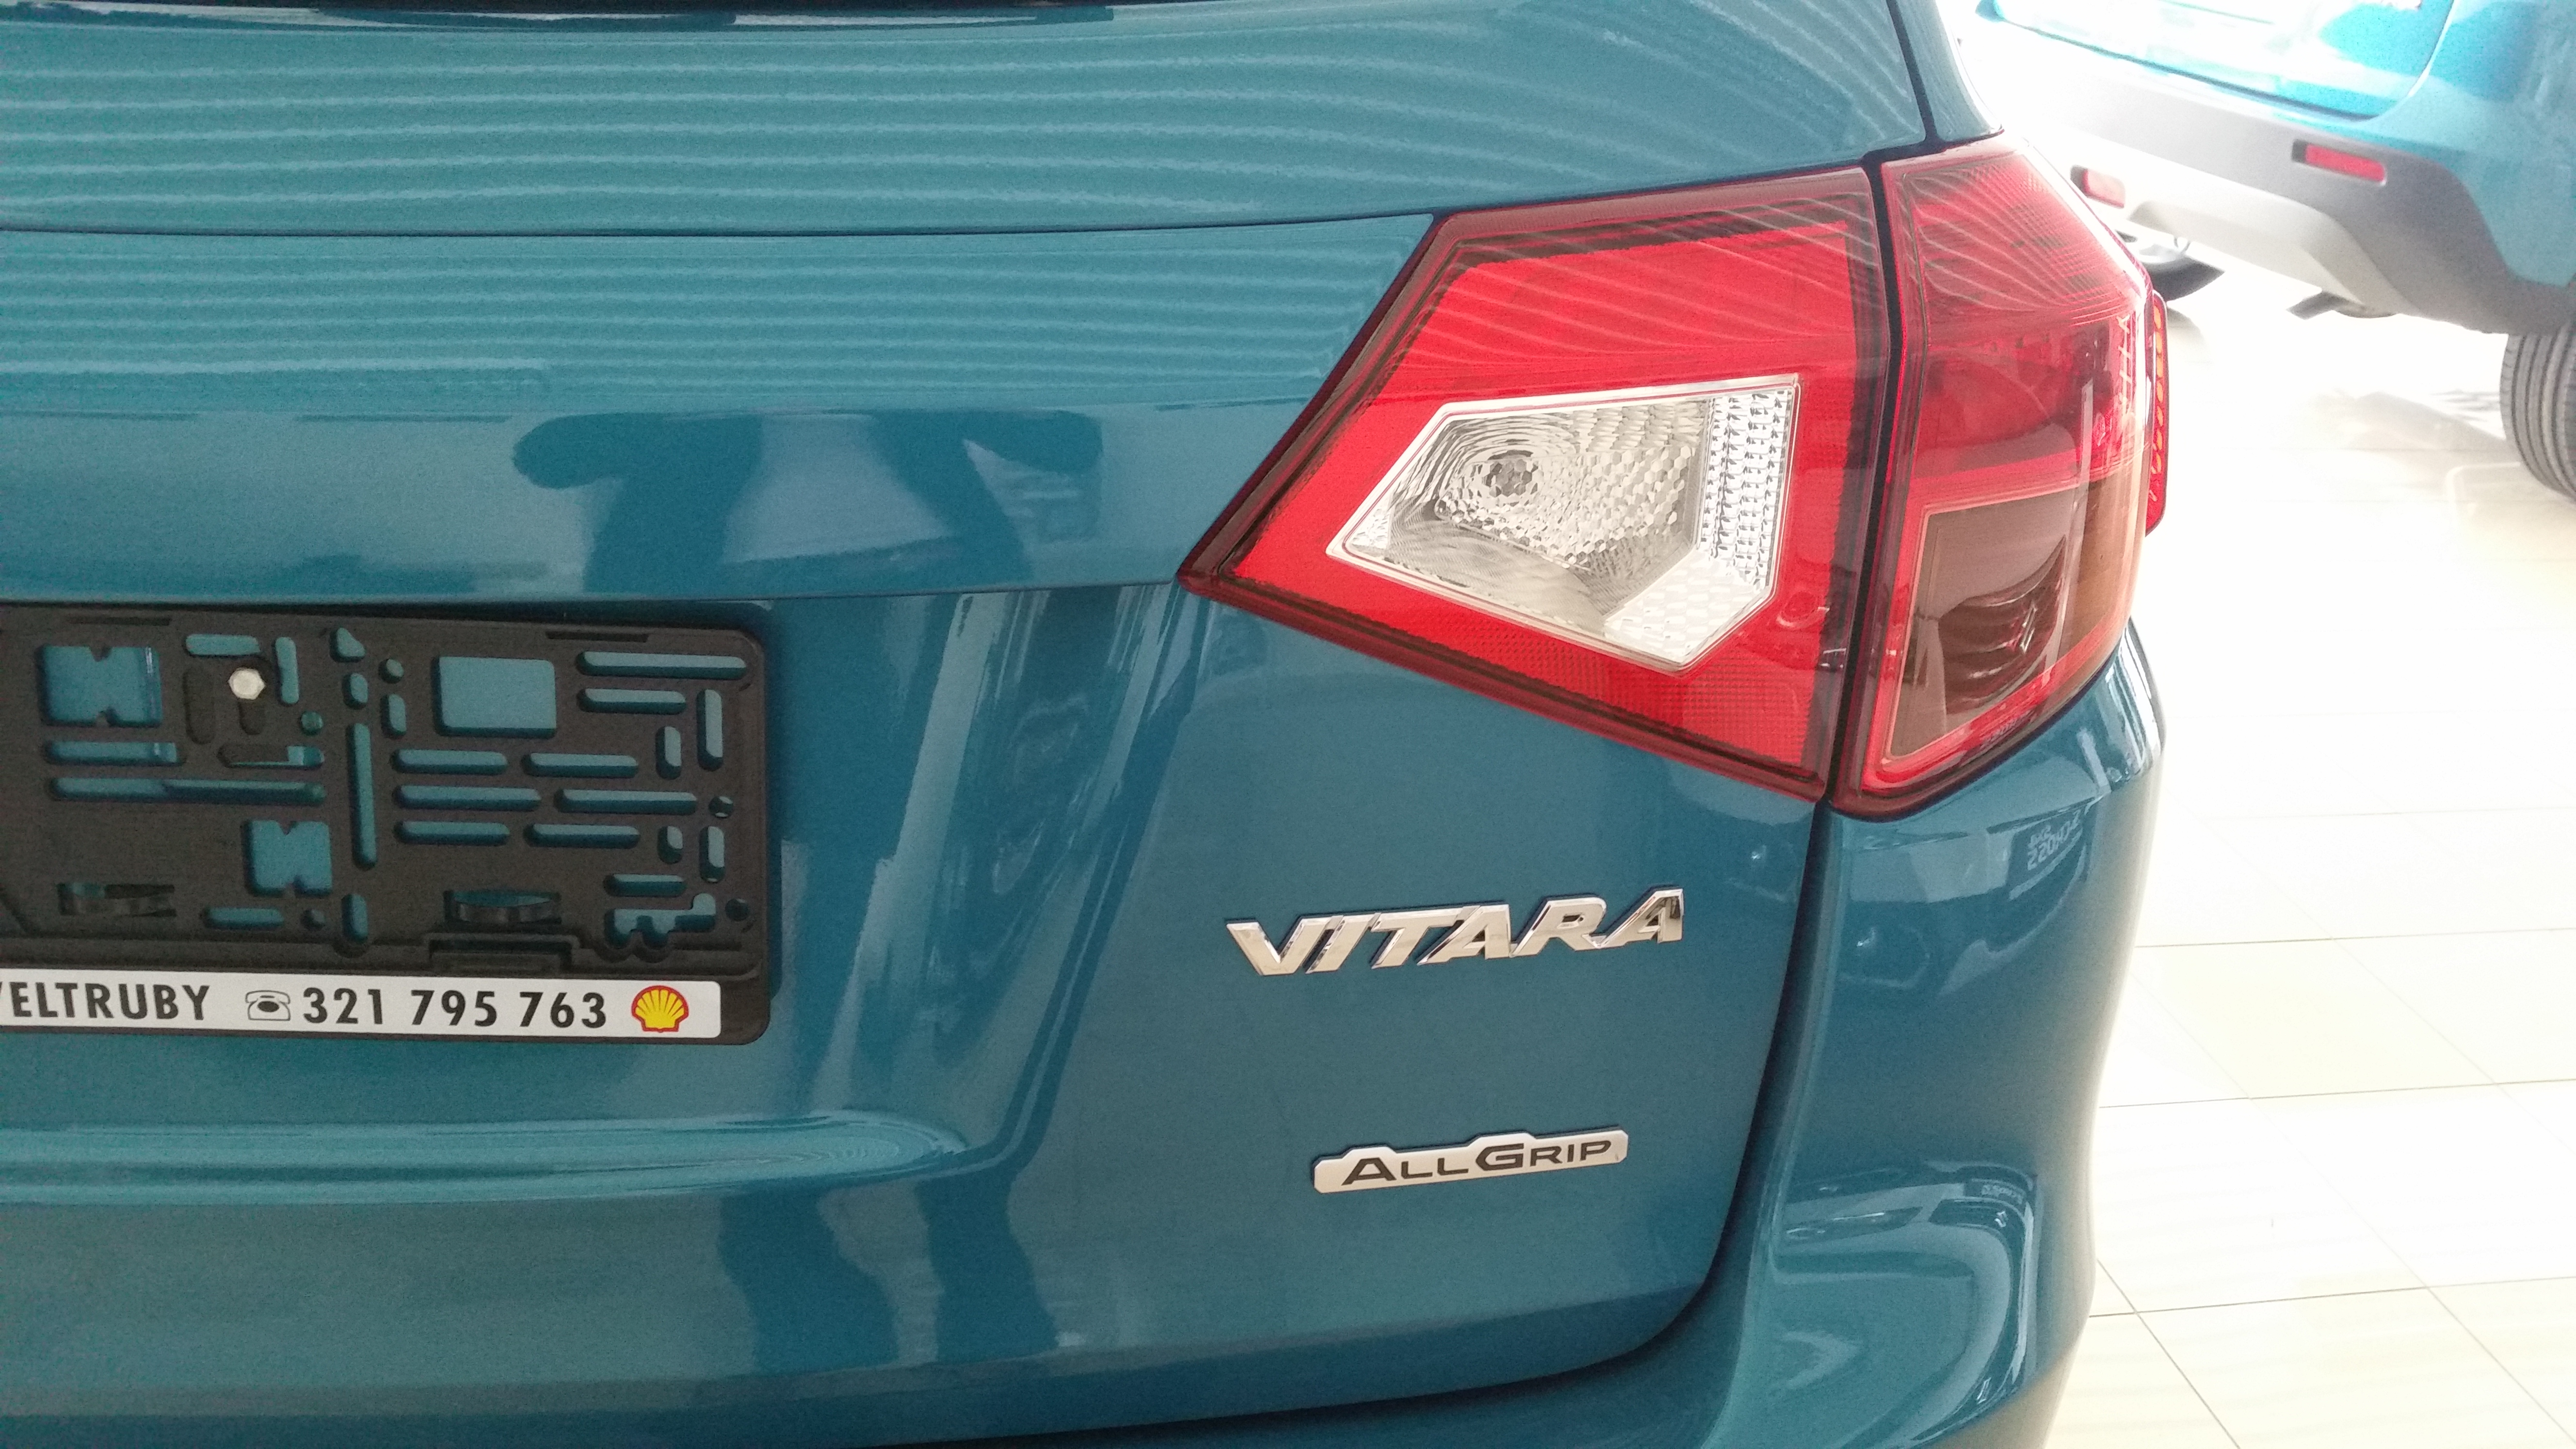 Suzuki Vitara AllGrip 4x4